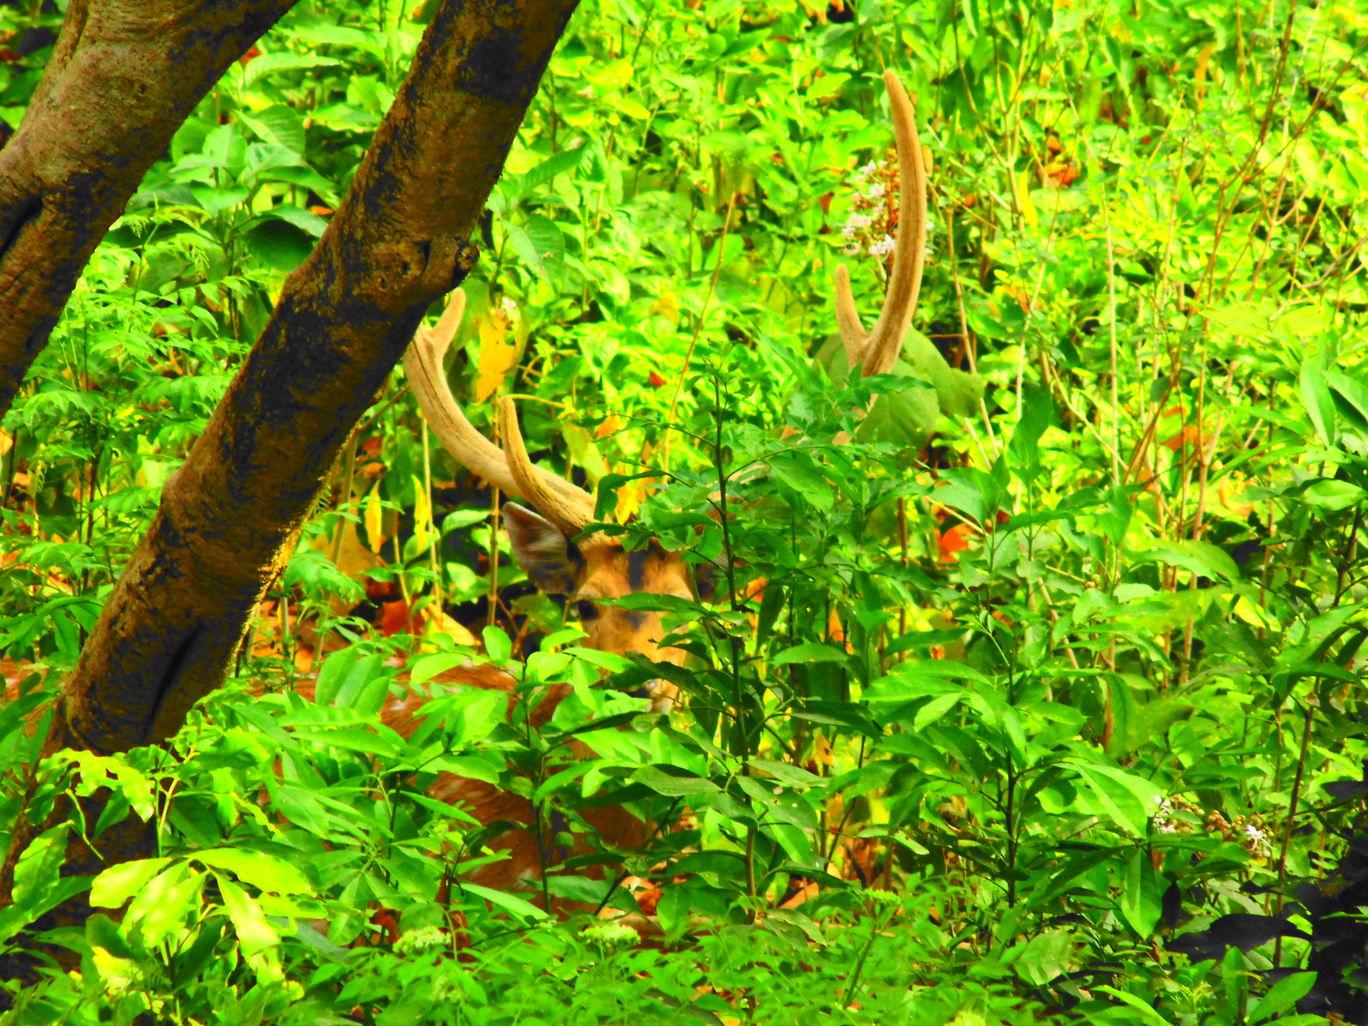 Photo of Jim Corbett National Park By Aaditya Vikram